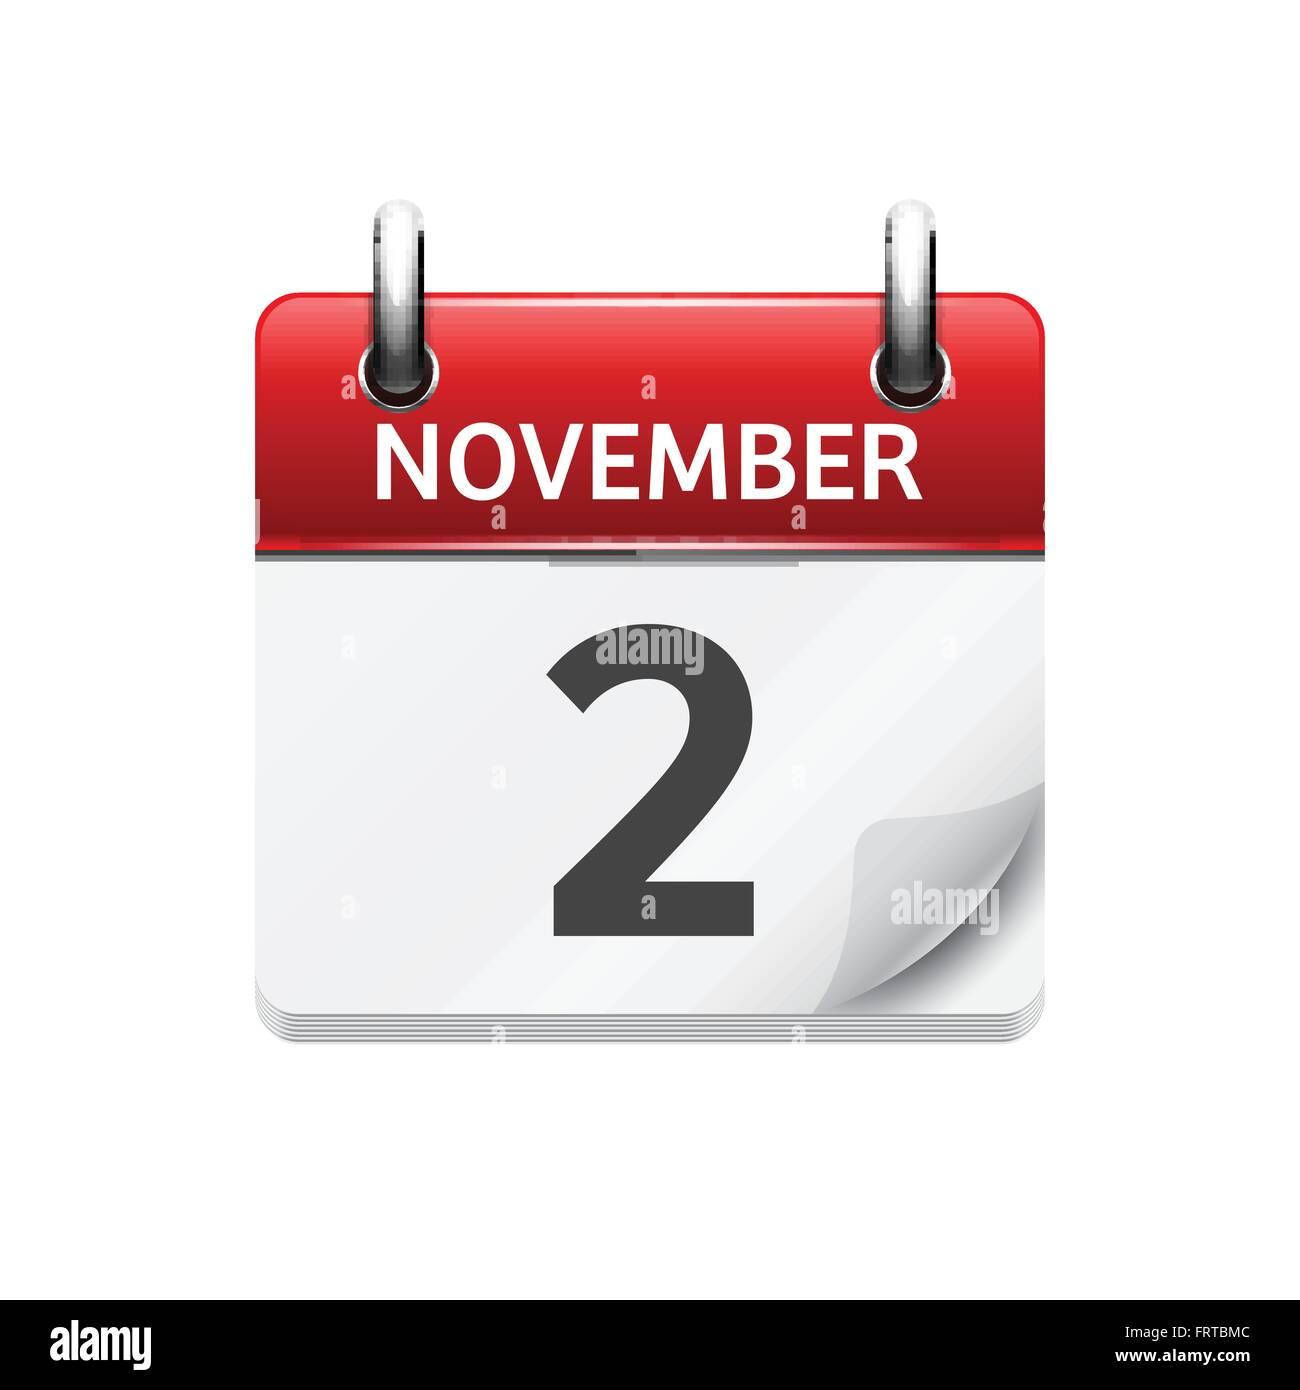 Daily Calendar Clipart : November vector flat daily calendar icon date and